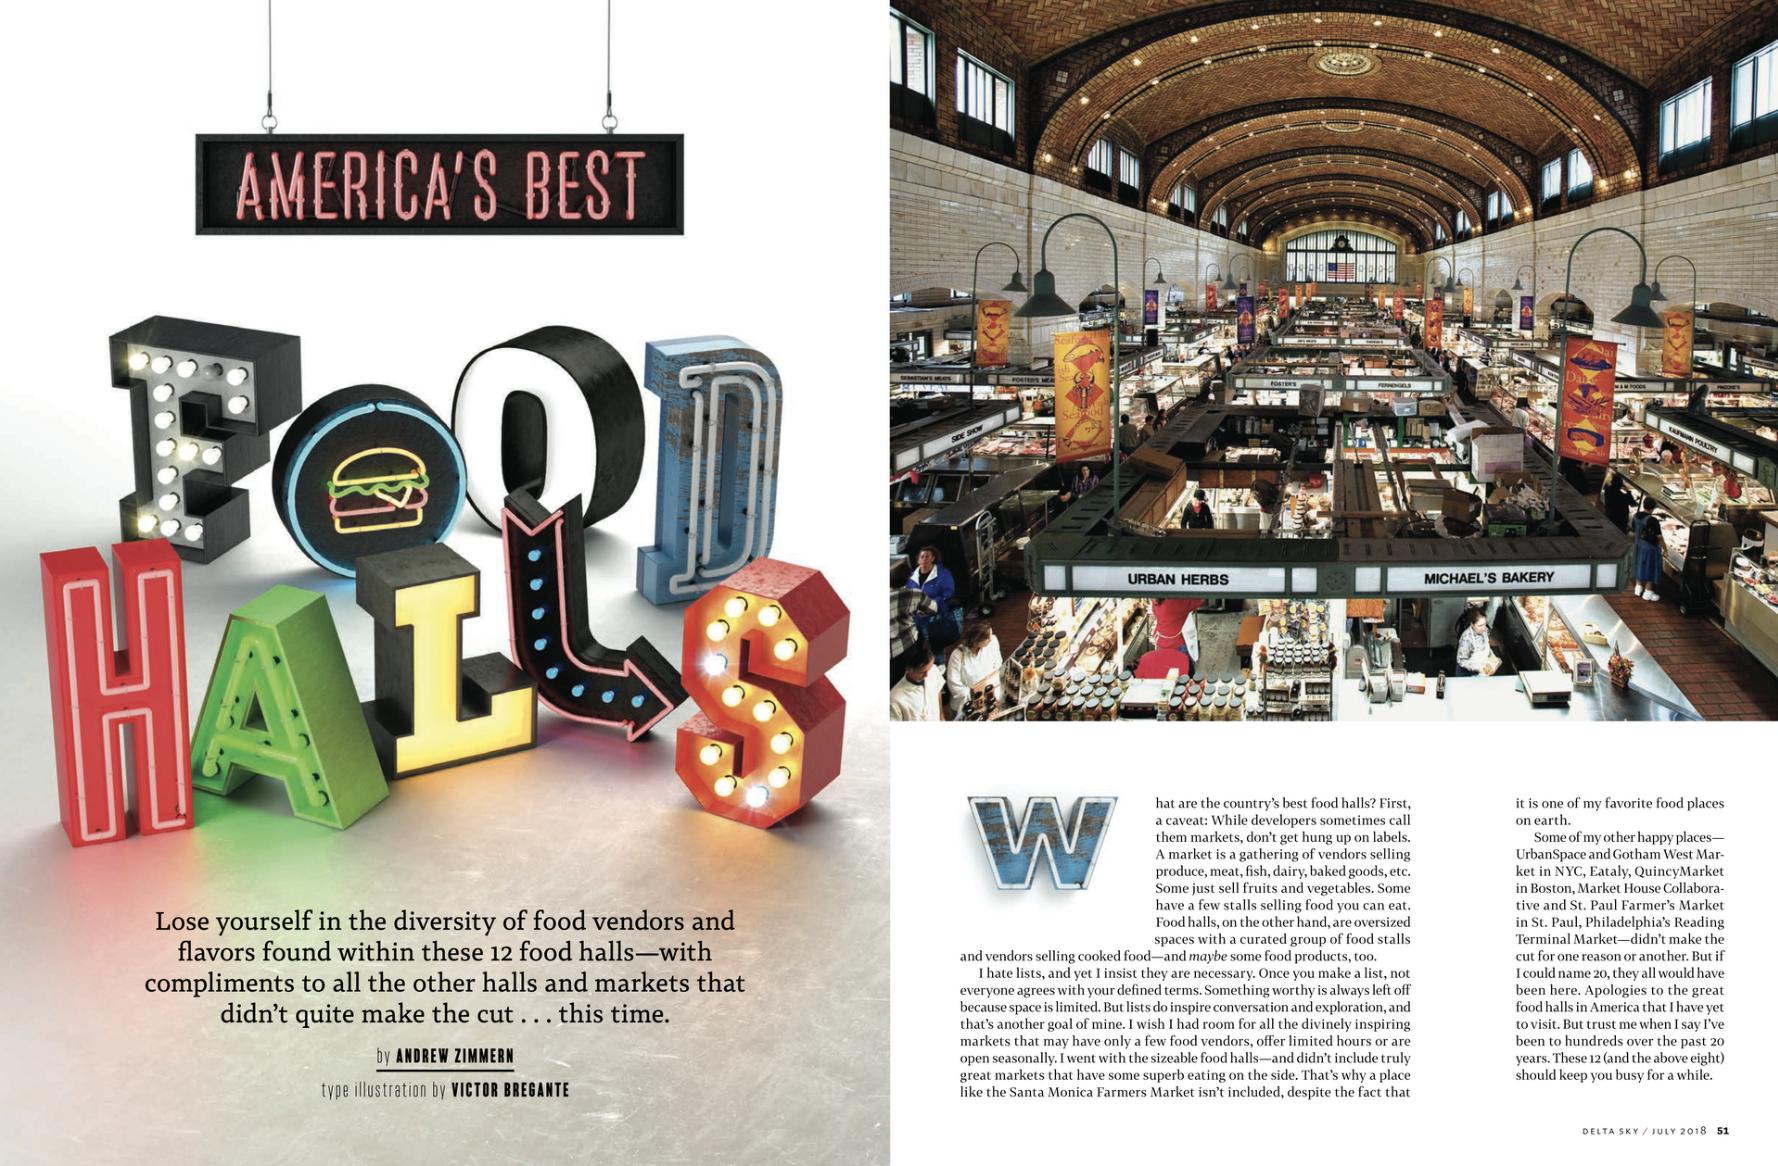 America's Best Foodhalls